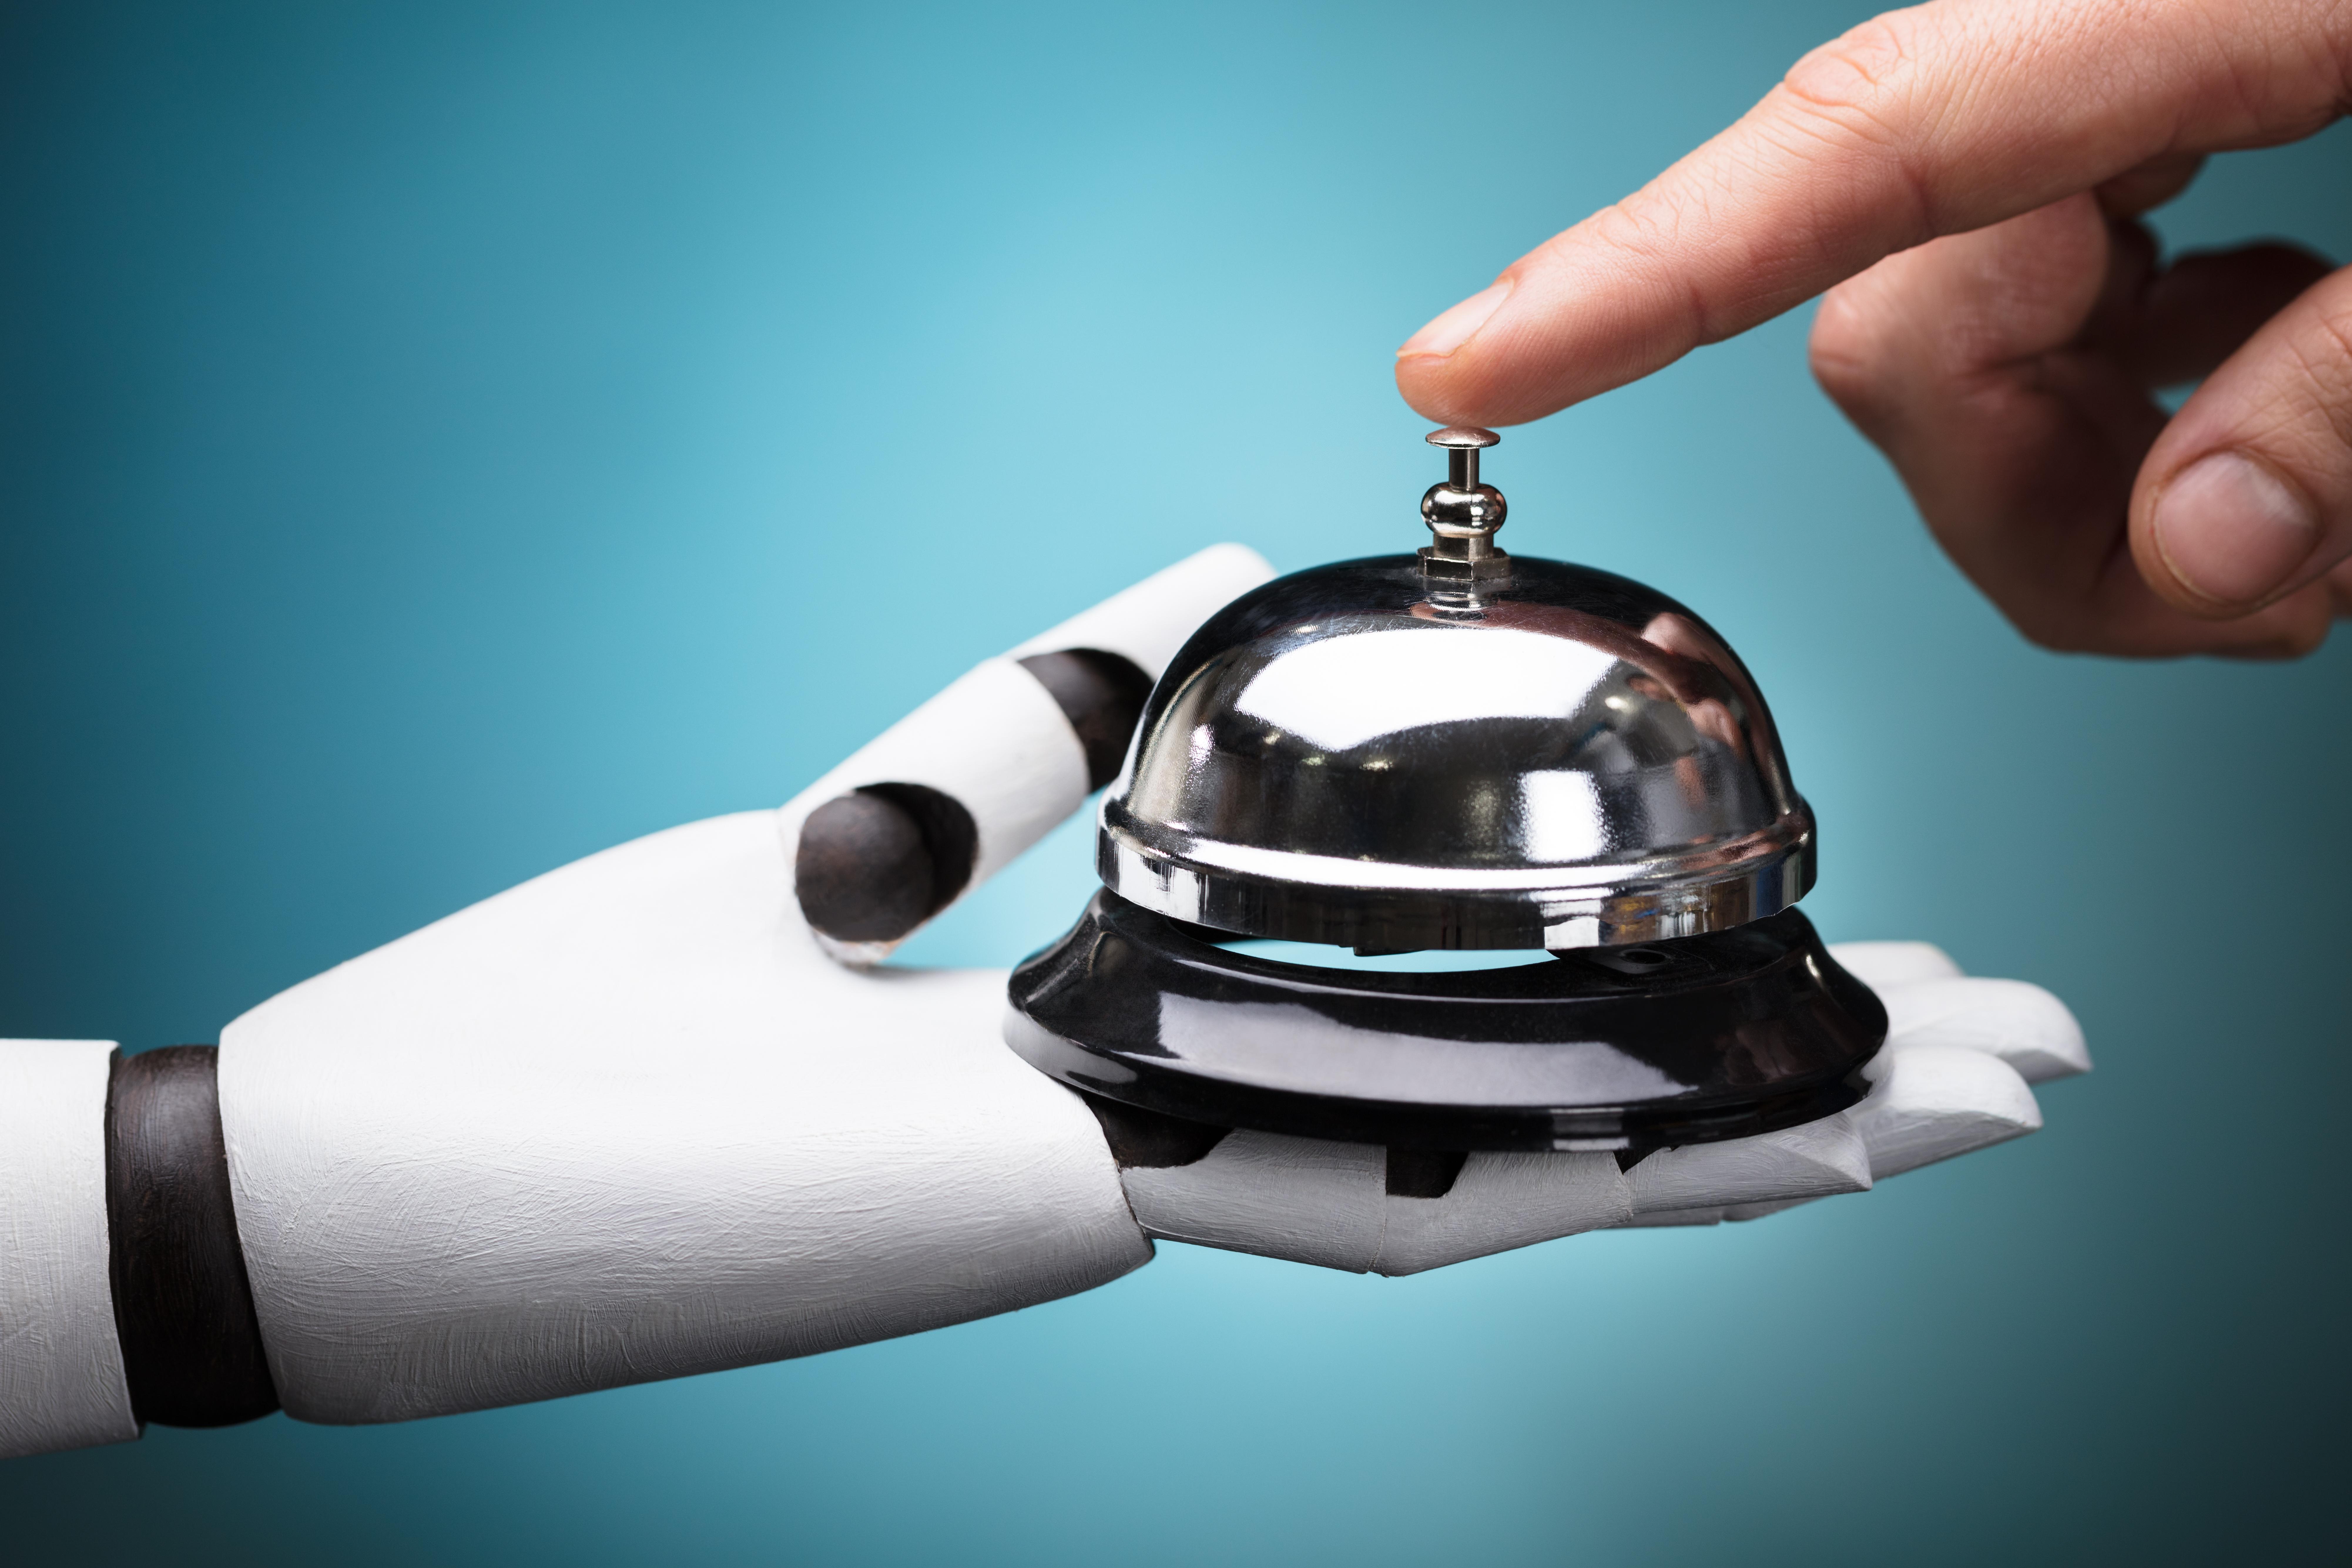 Meer over hoteltechnologie